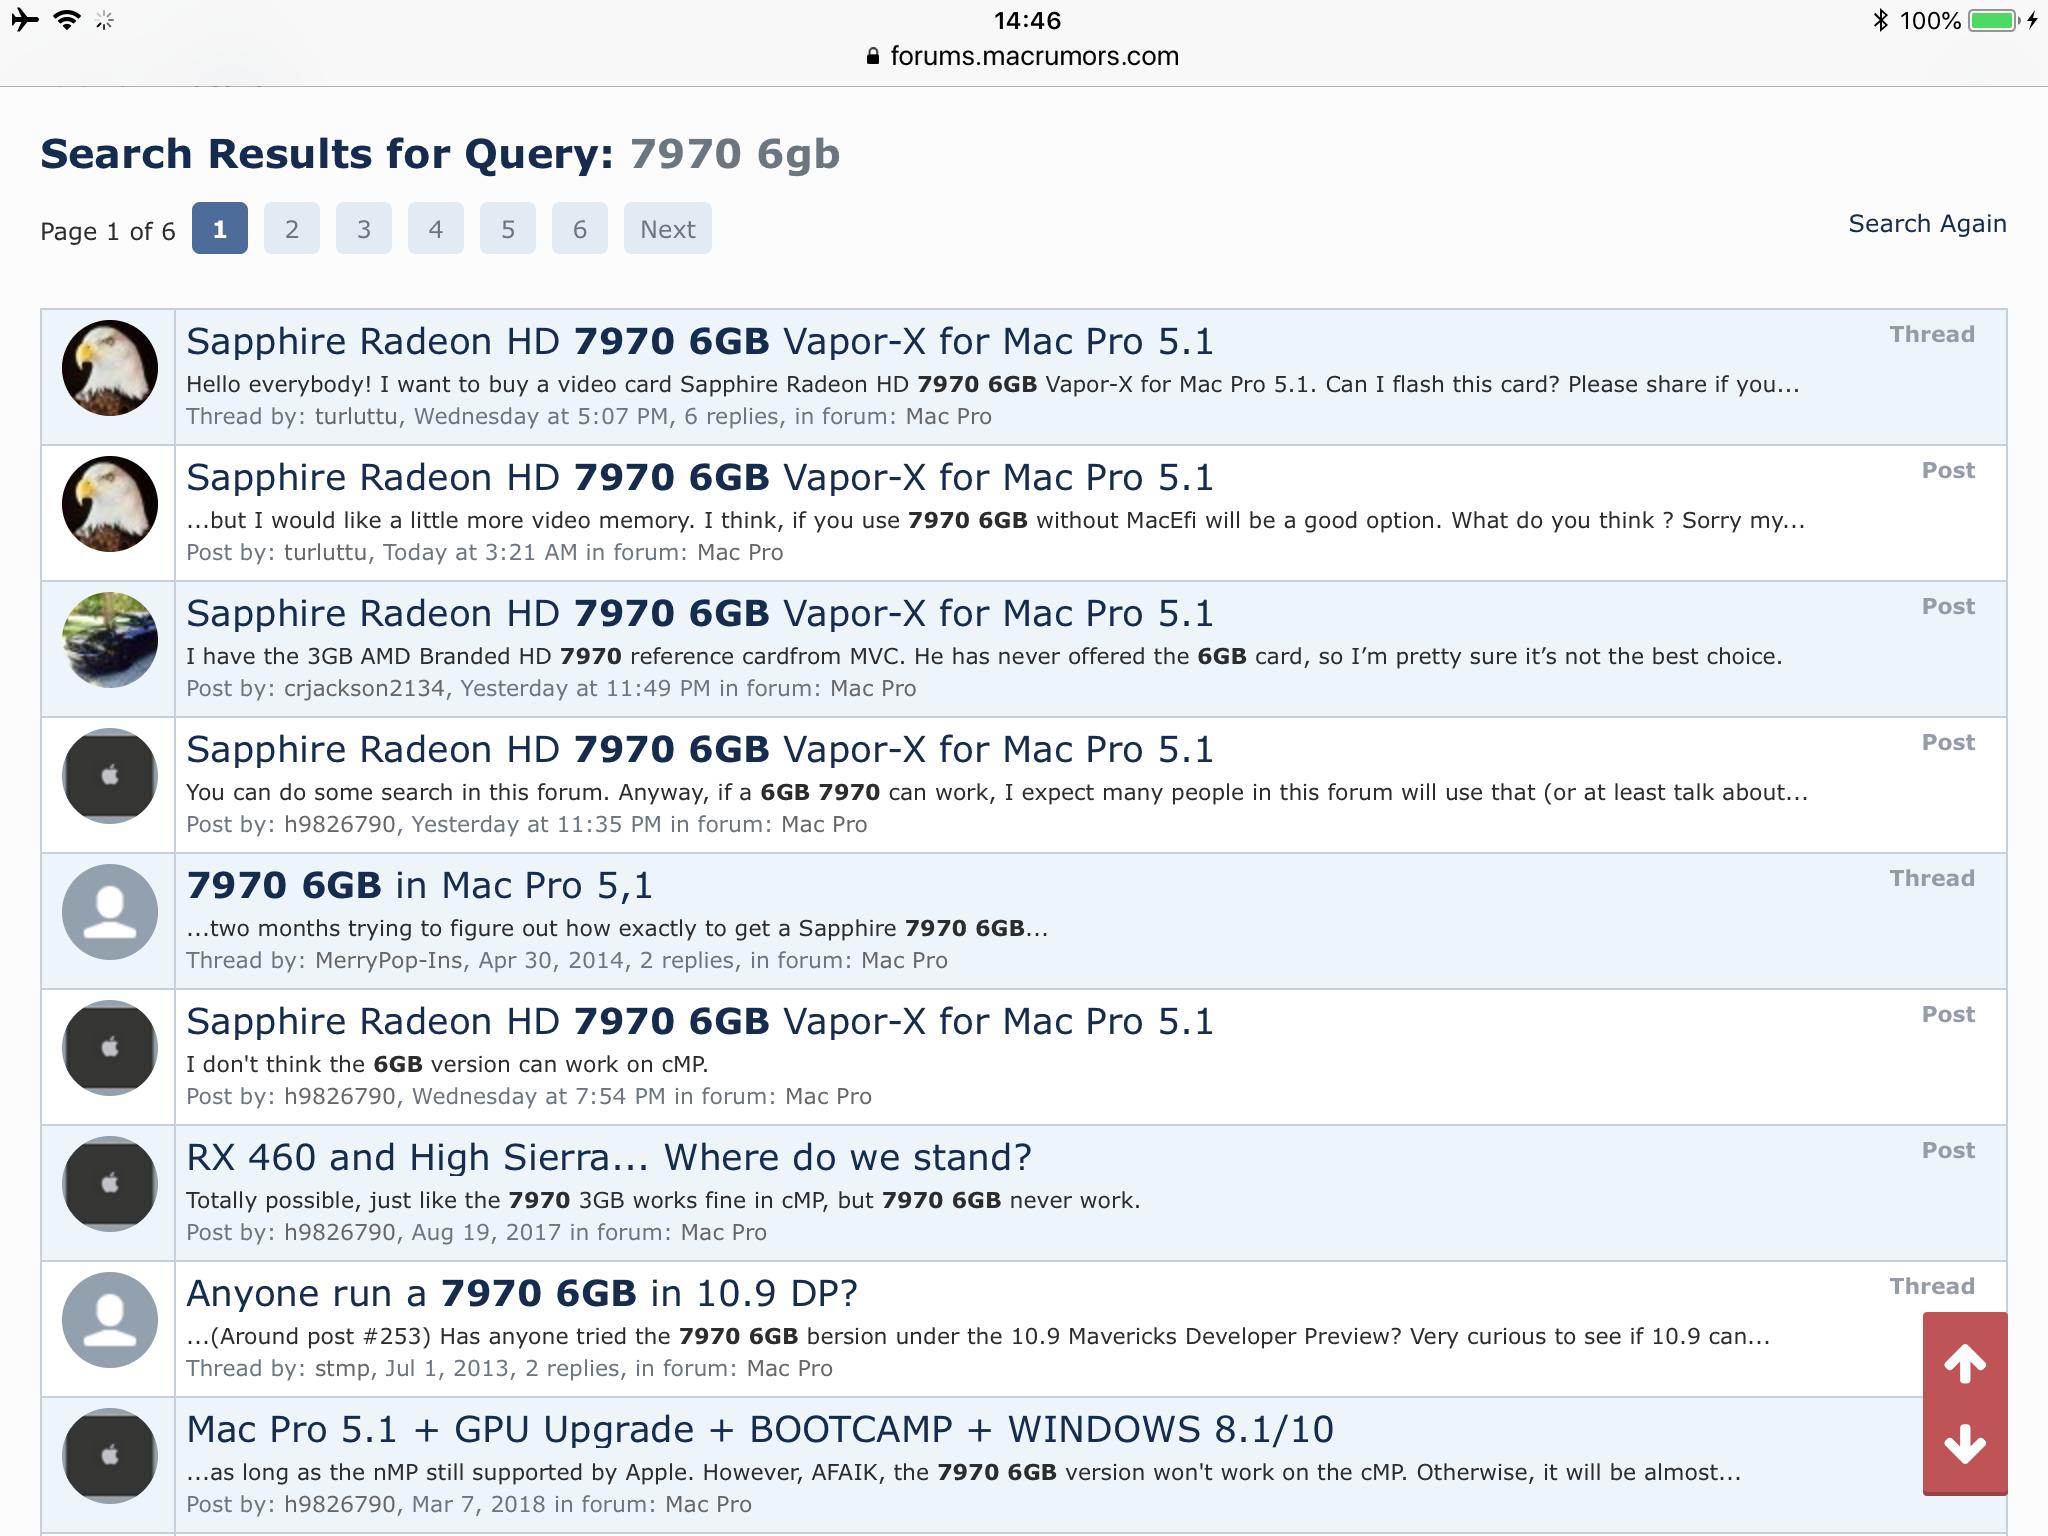 Sapphire Radeon HD 7970 6GB Vapor-X for Mac Pro 5 1